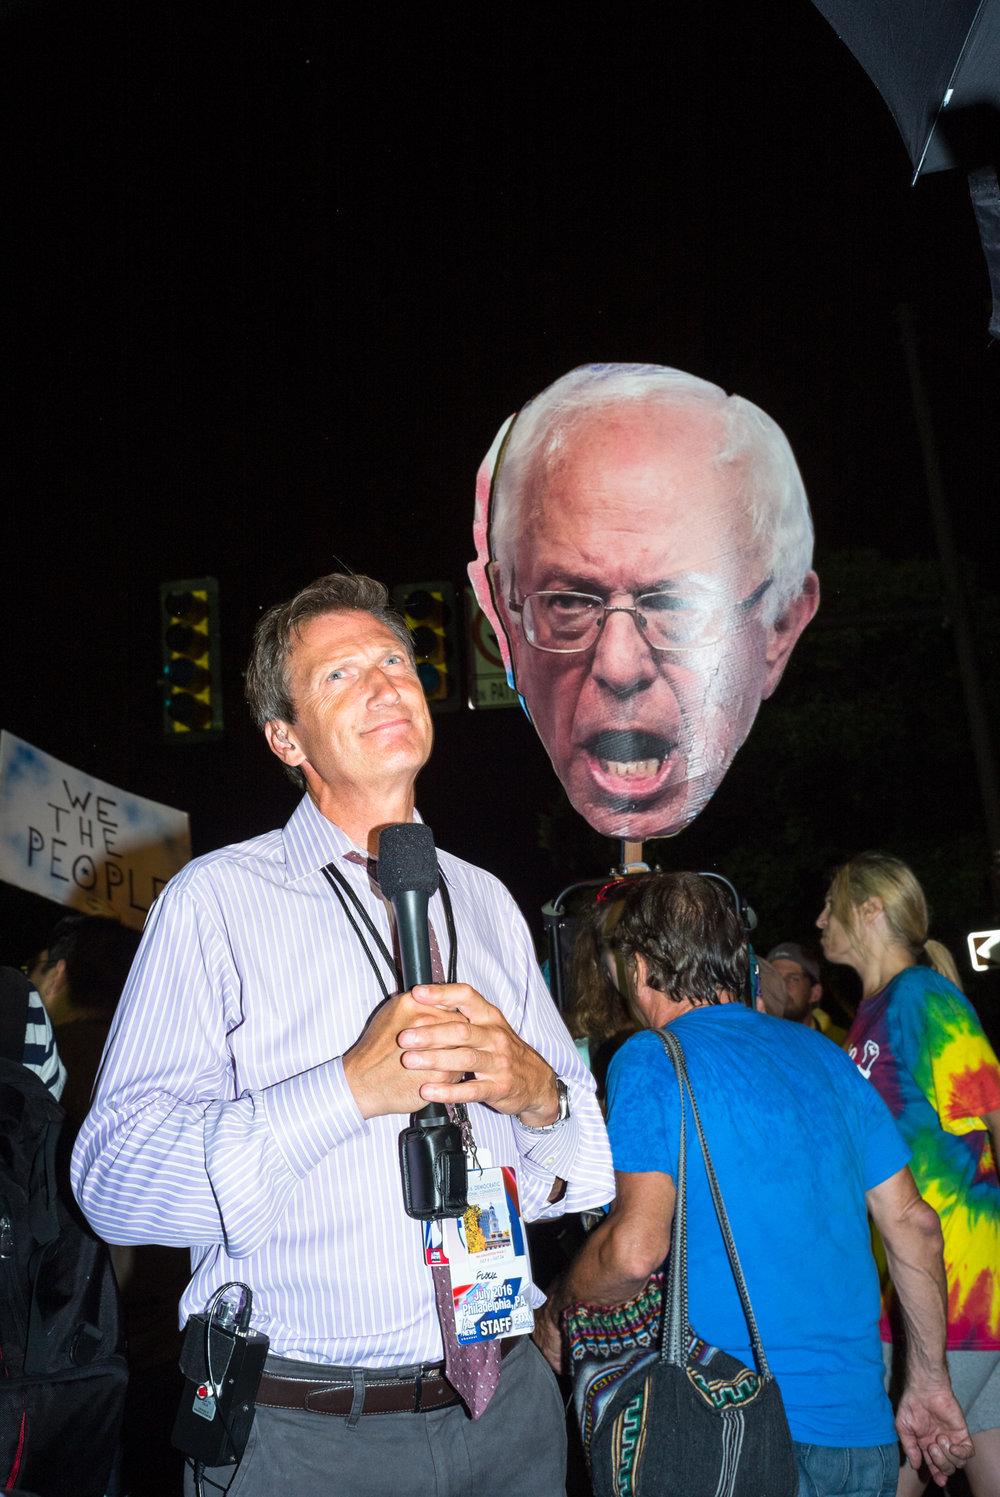 nick dinatale_democratic national convention dnc_2016_philadelphia_leica-24.jpg